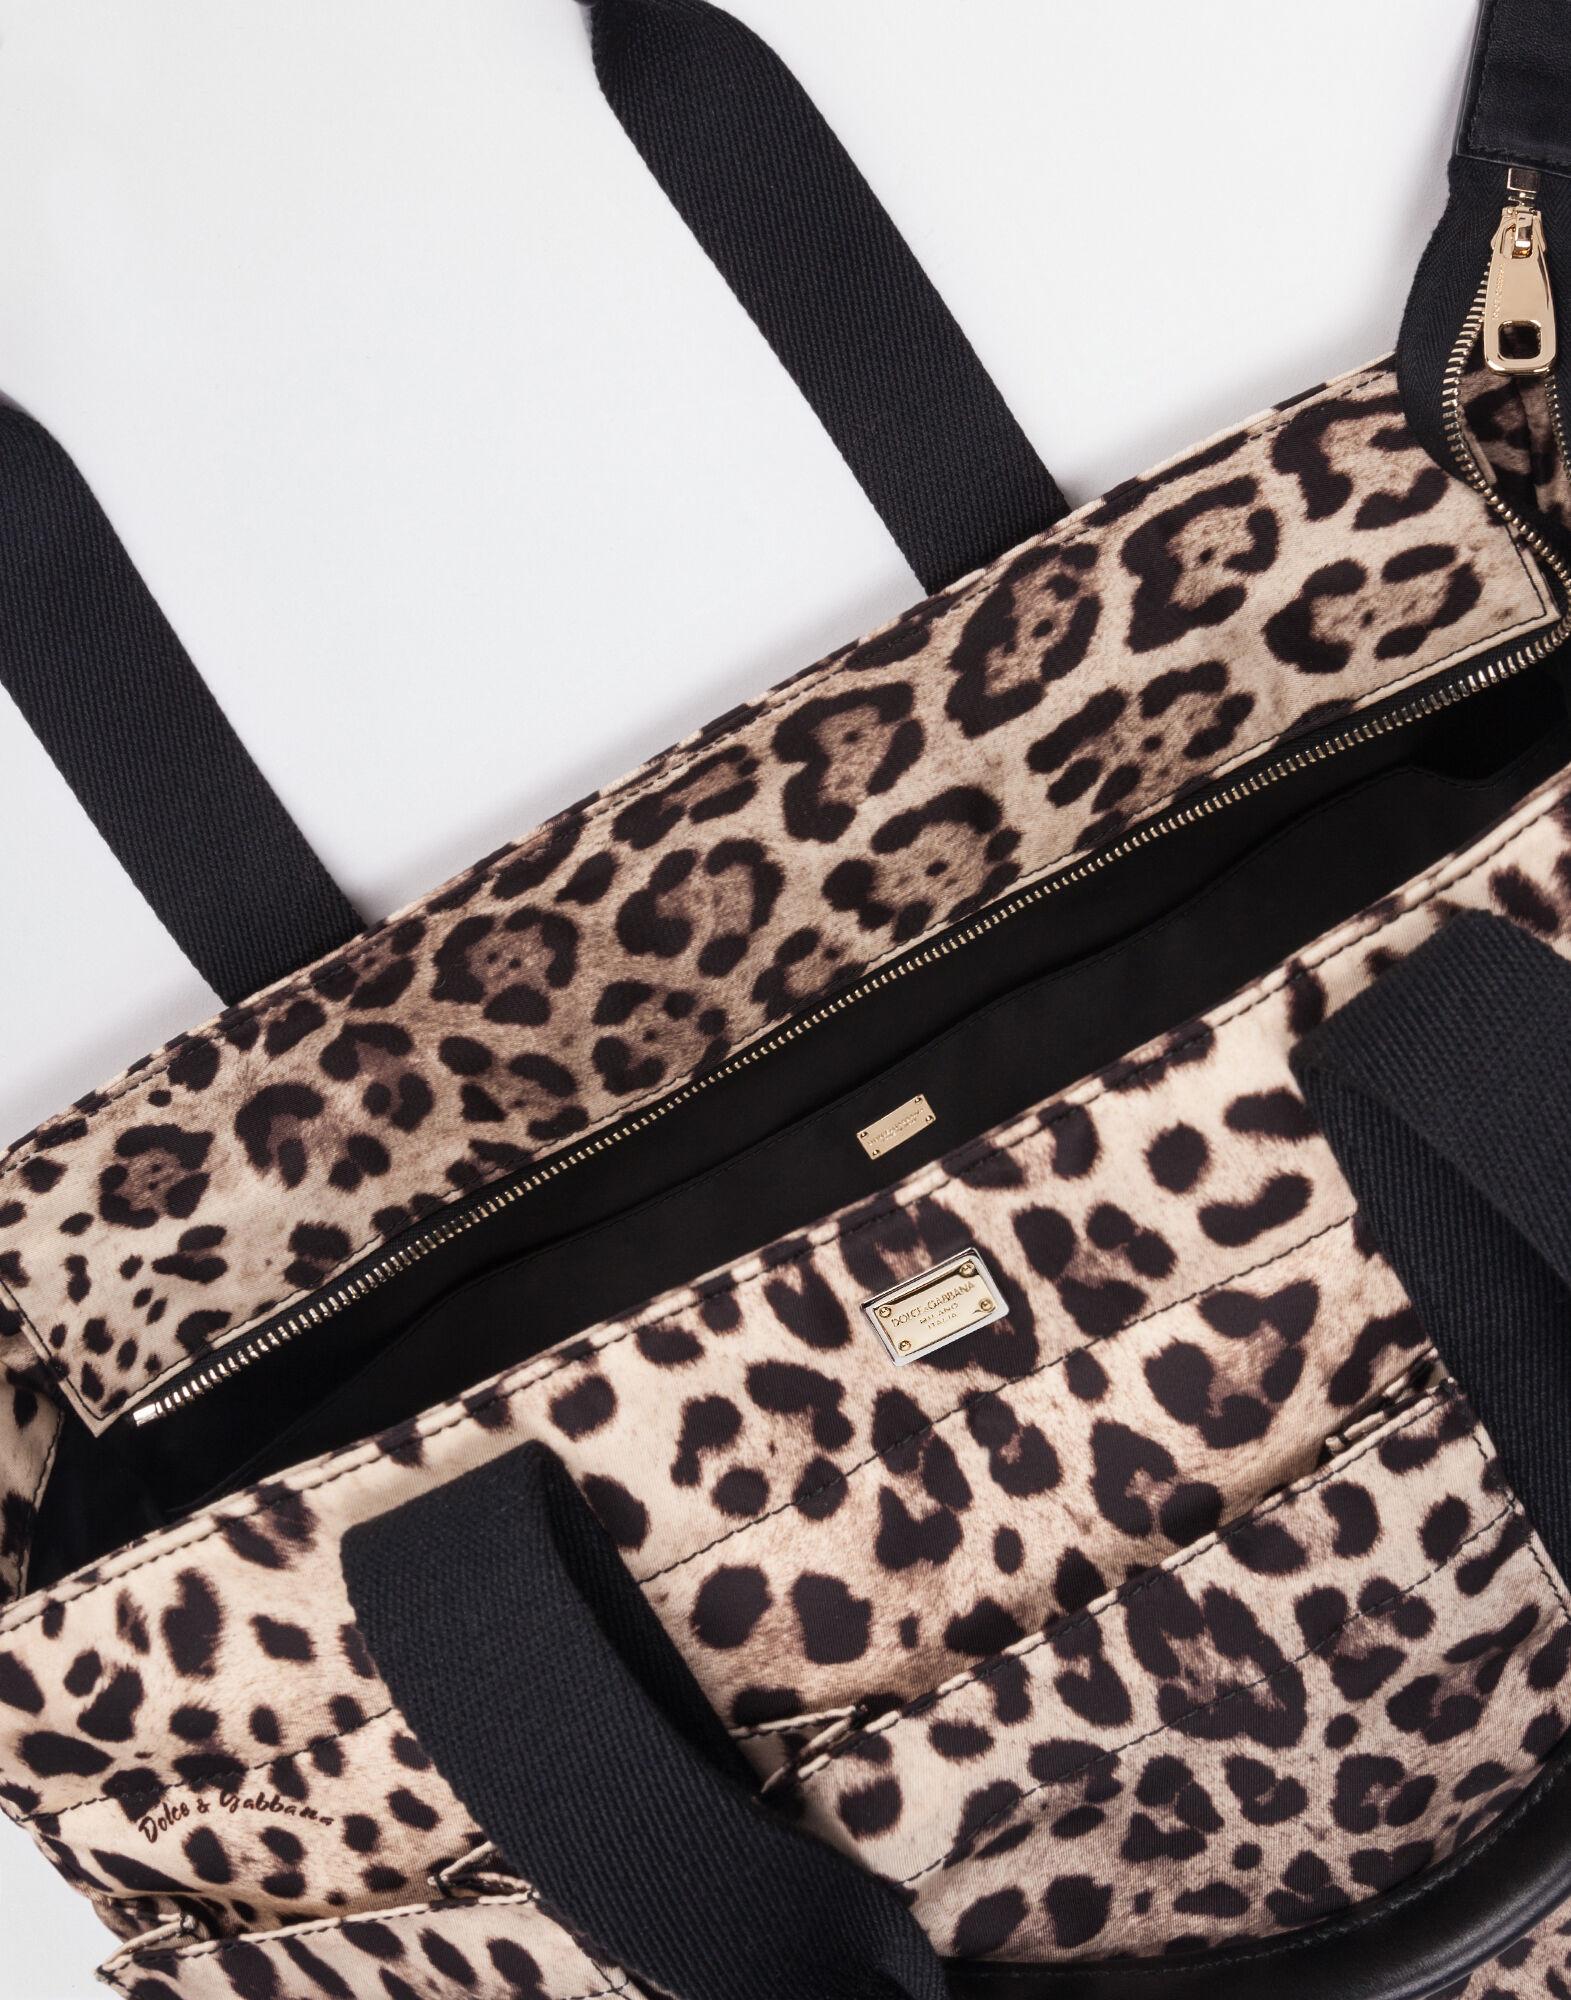 NYLON NAPPY BAG WITH LEO PRINT